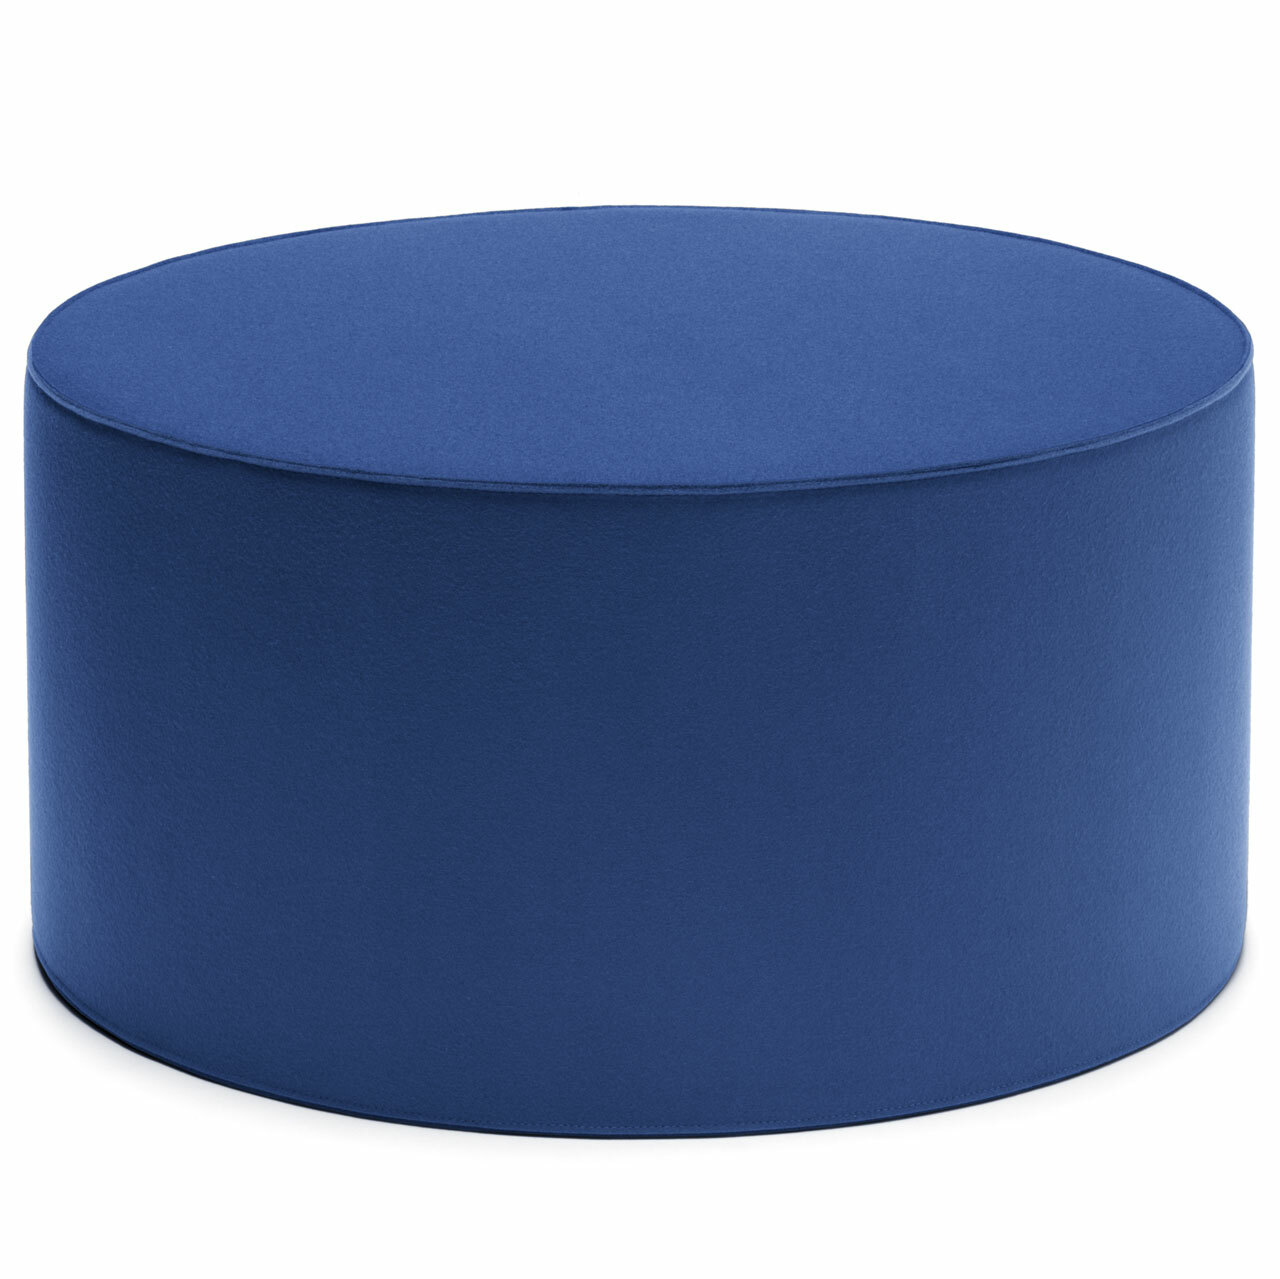 Sitzmöbel Big Rondo